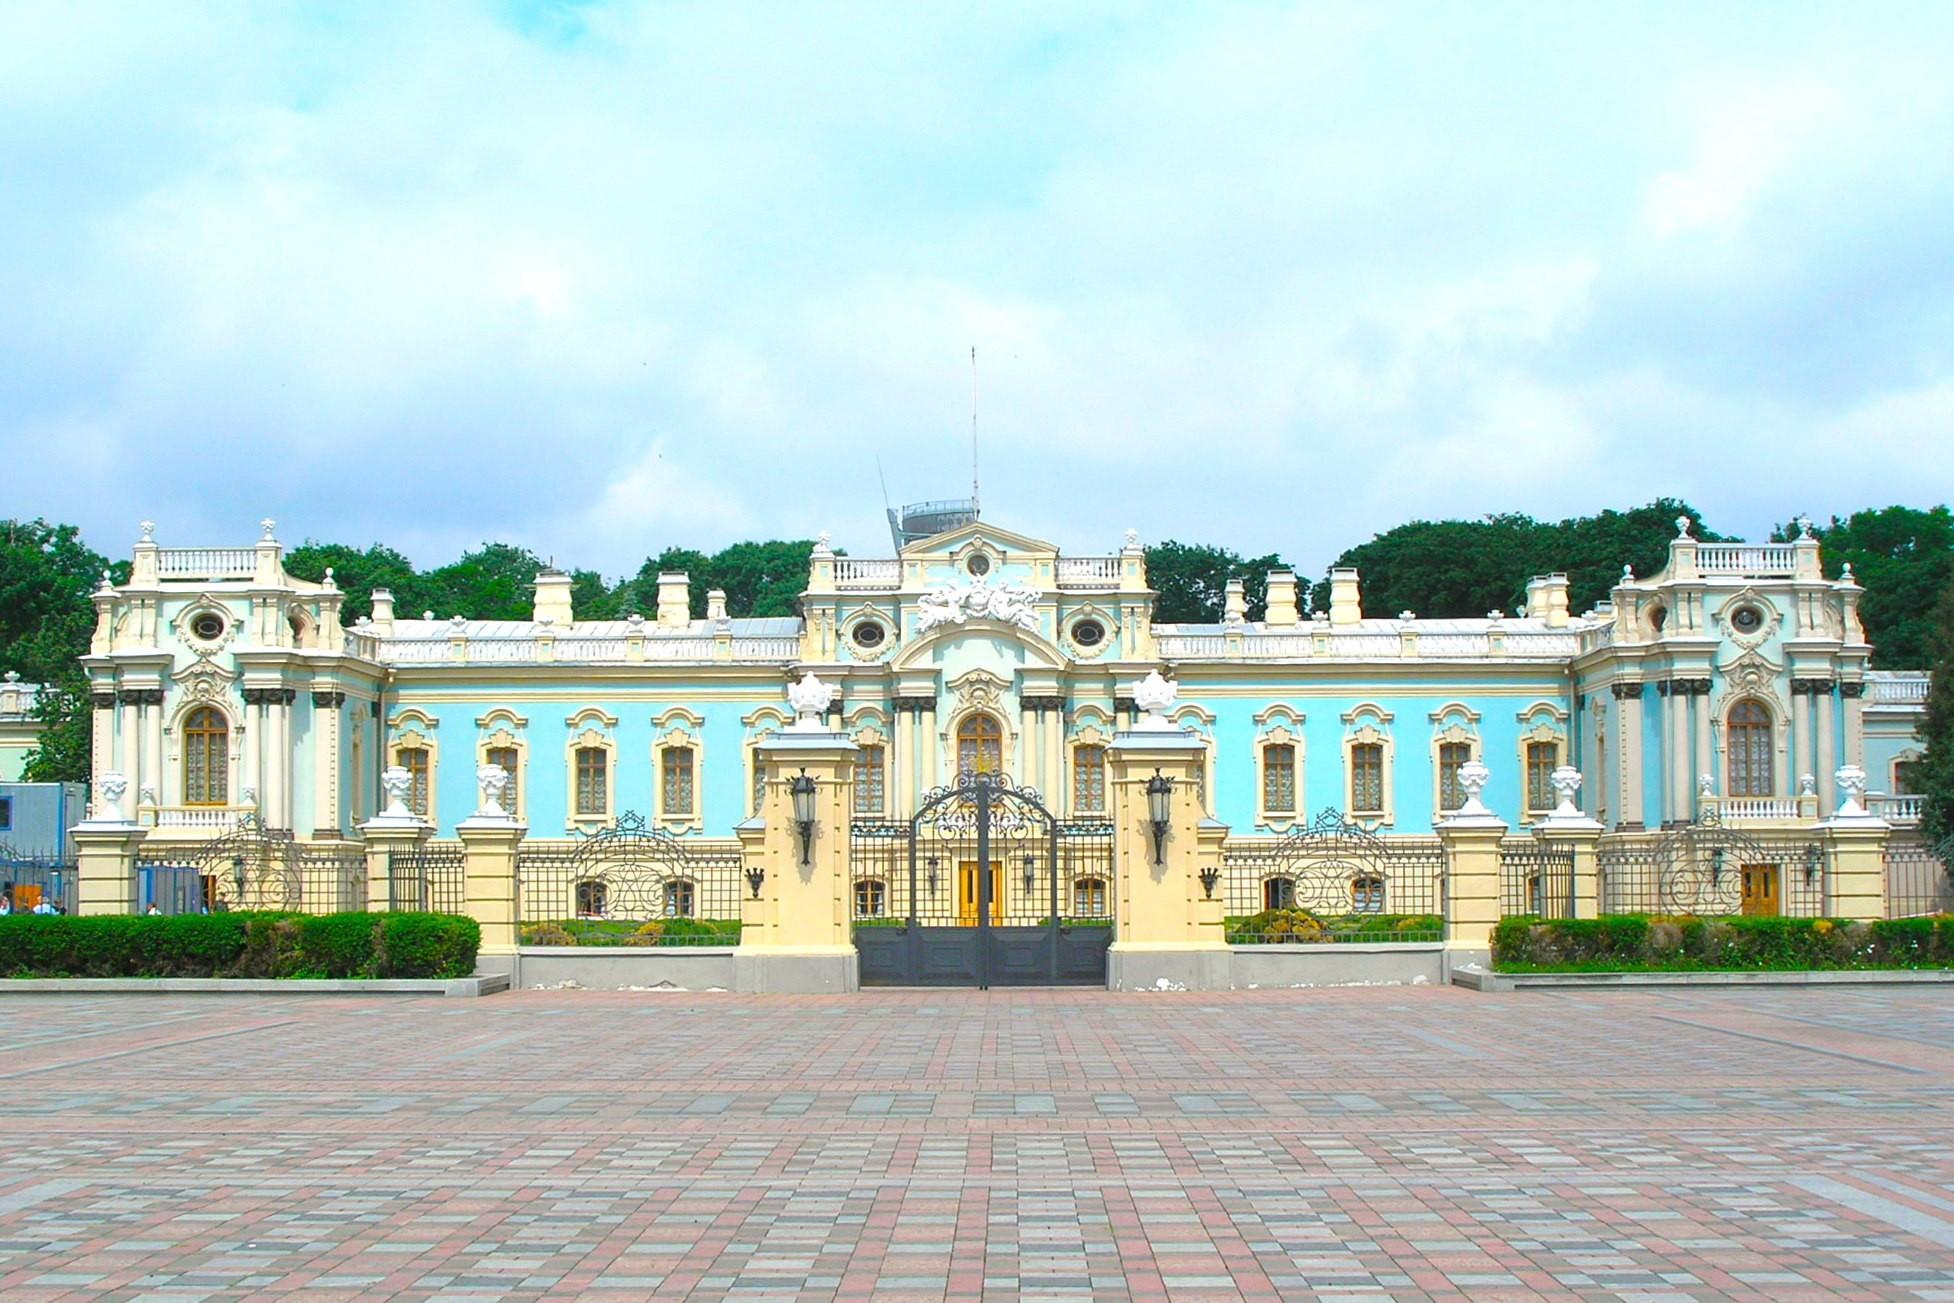 Maryinsky Palace residence of the Ukrainian President